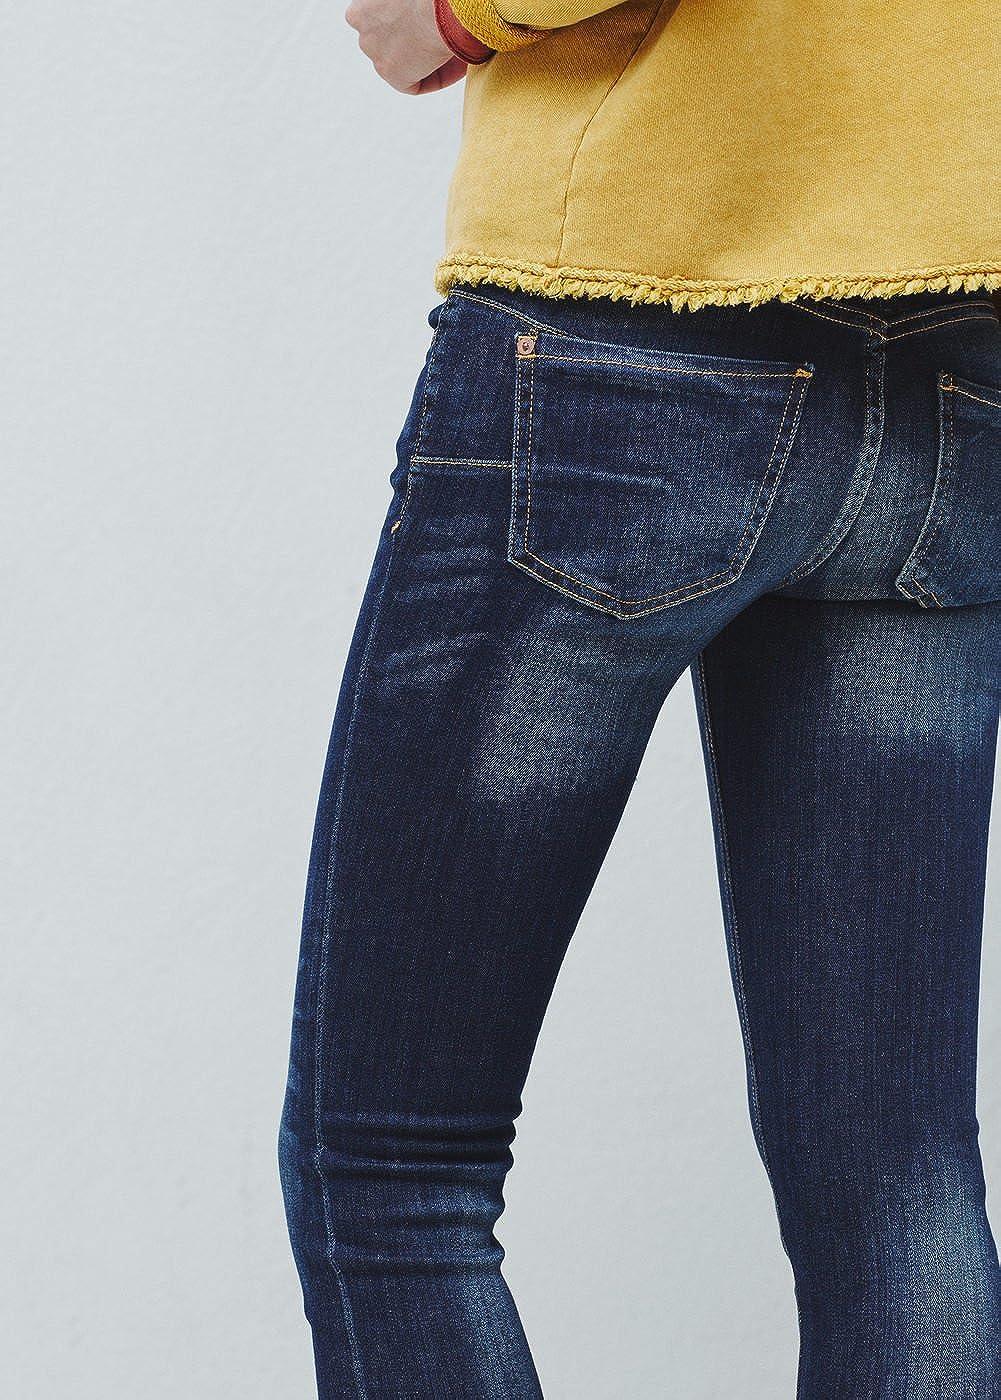 MANGO -Pantalones vaqueros Push-up Uptown Mujer Azul azul ...